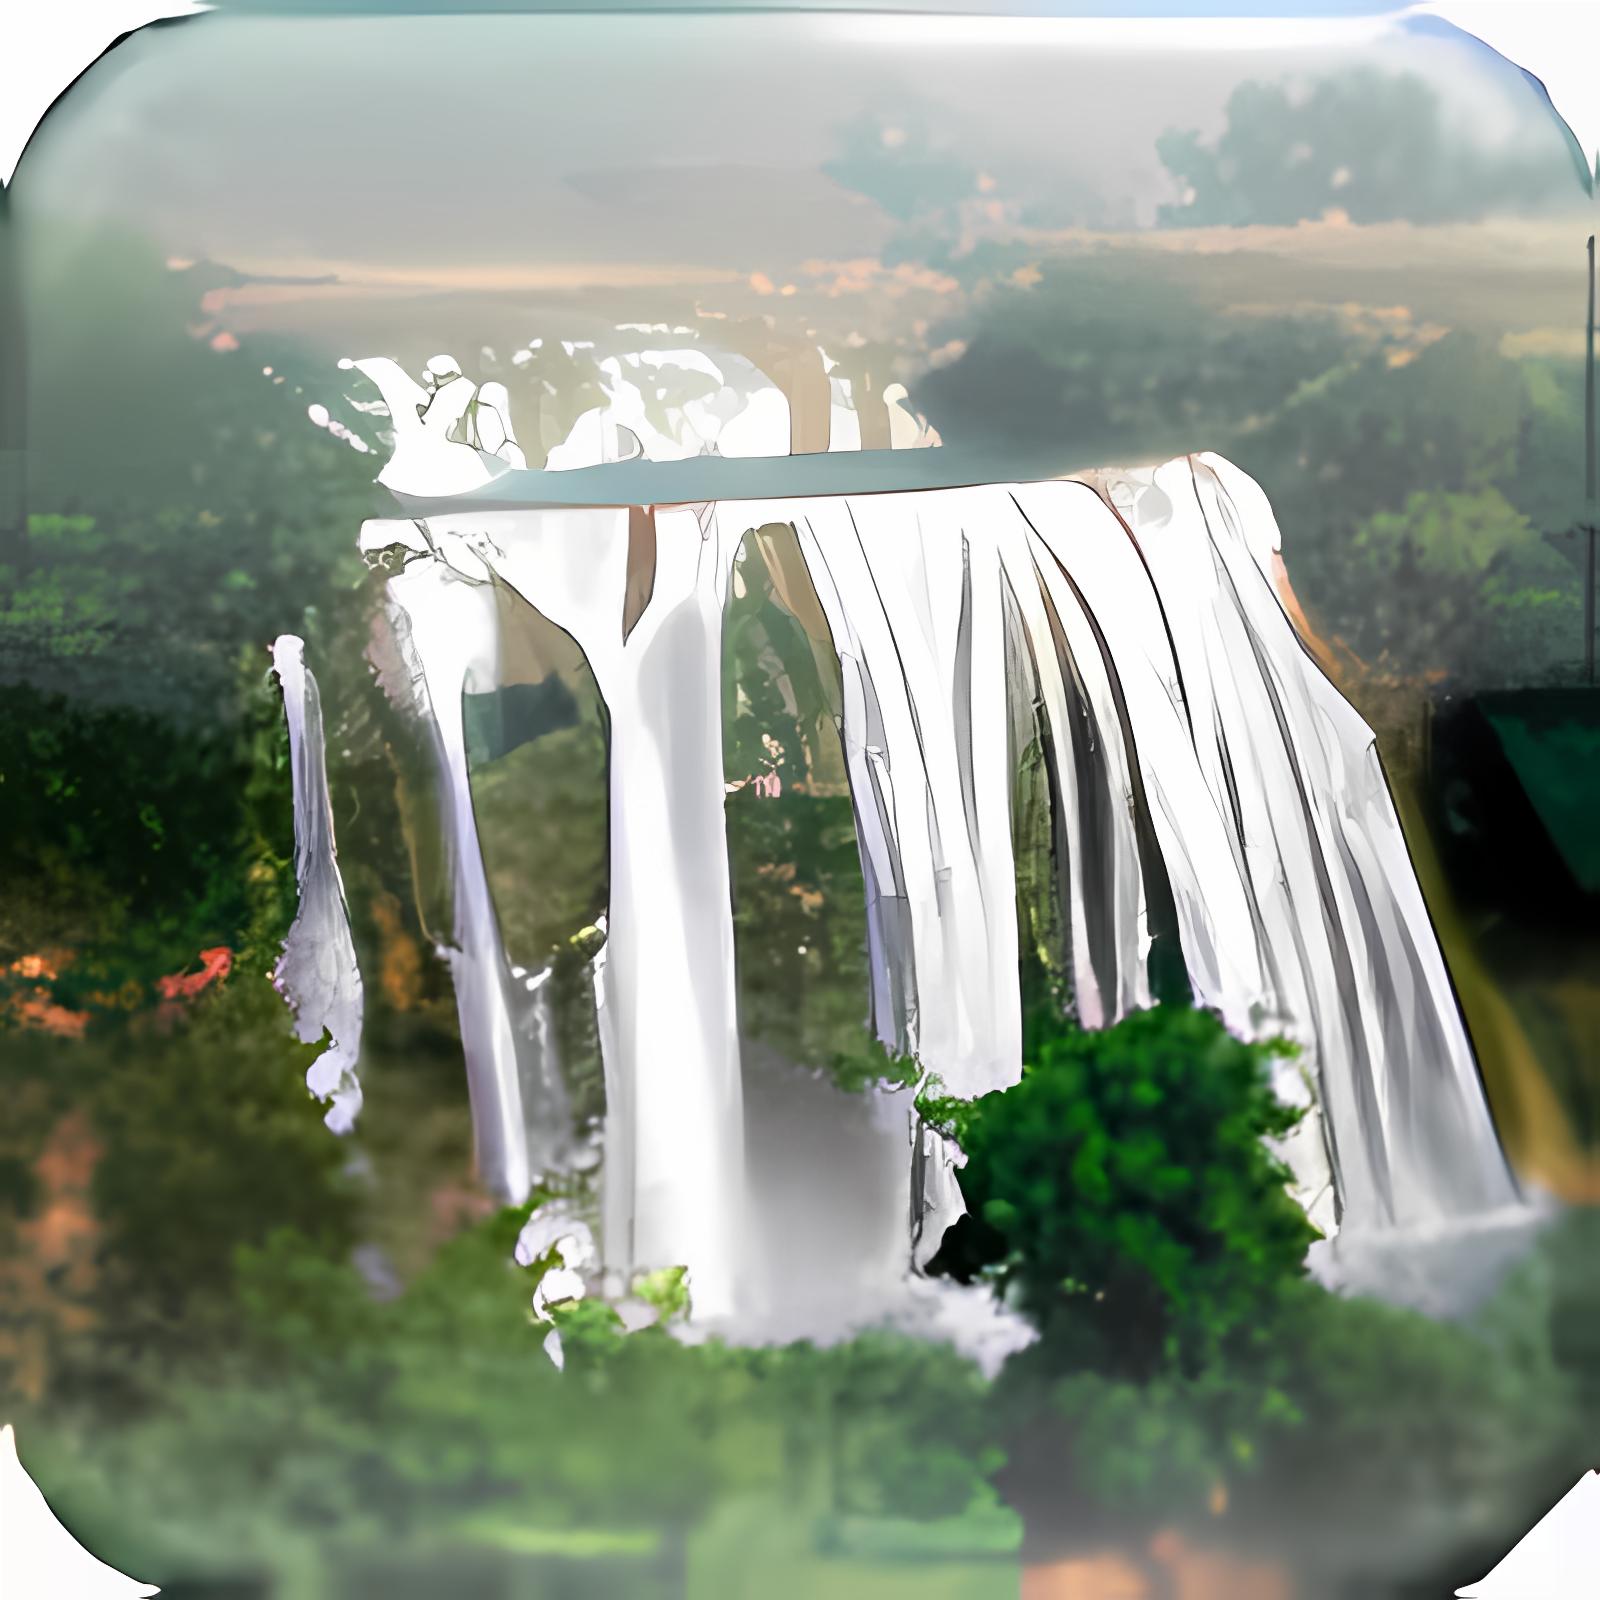 NFS Waterfalls 01 1.1